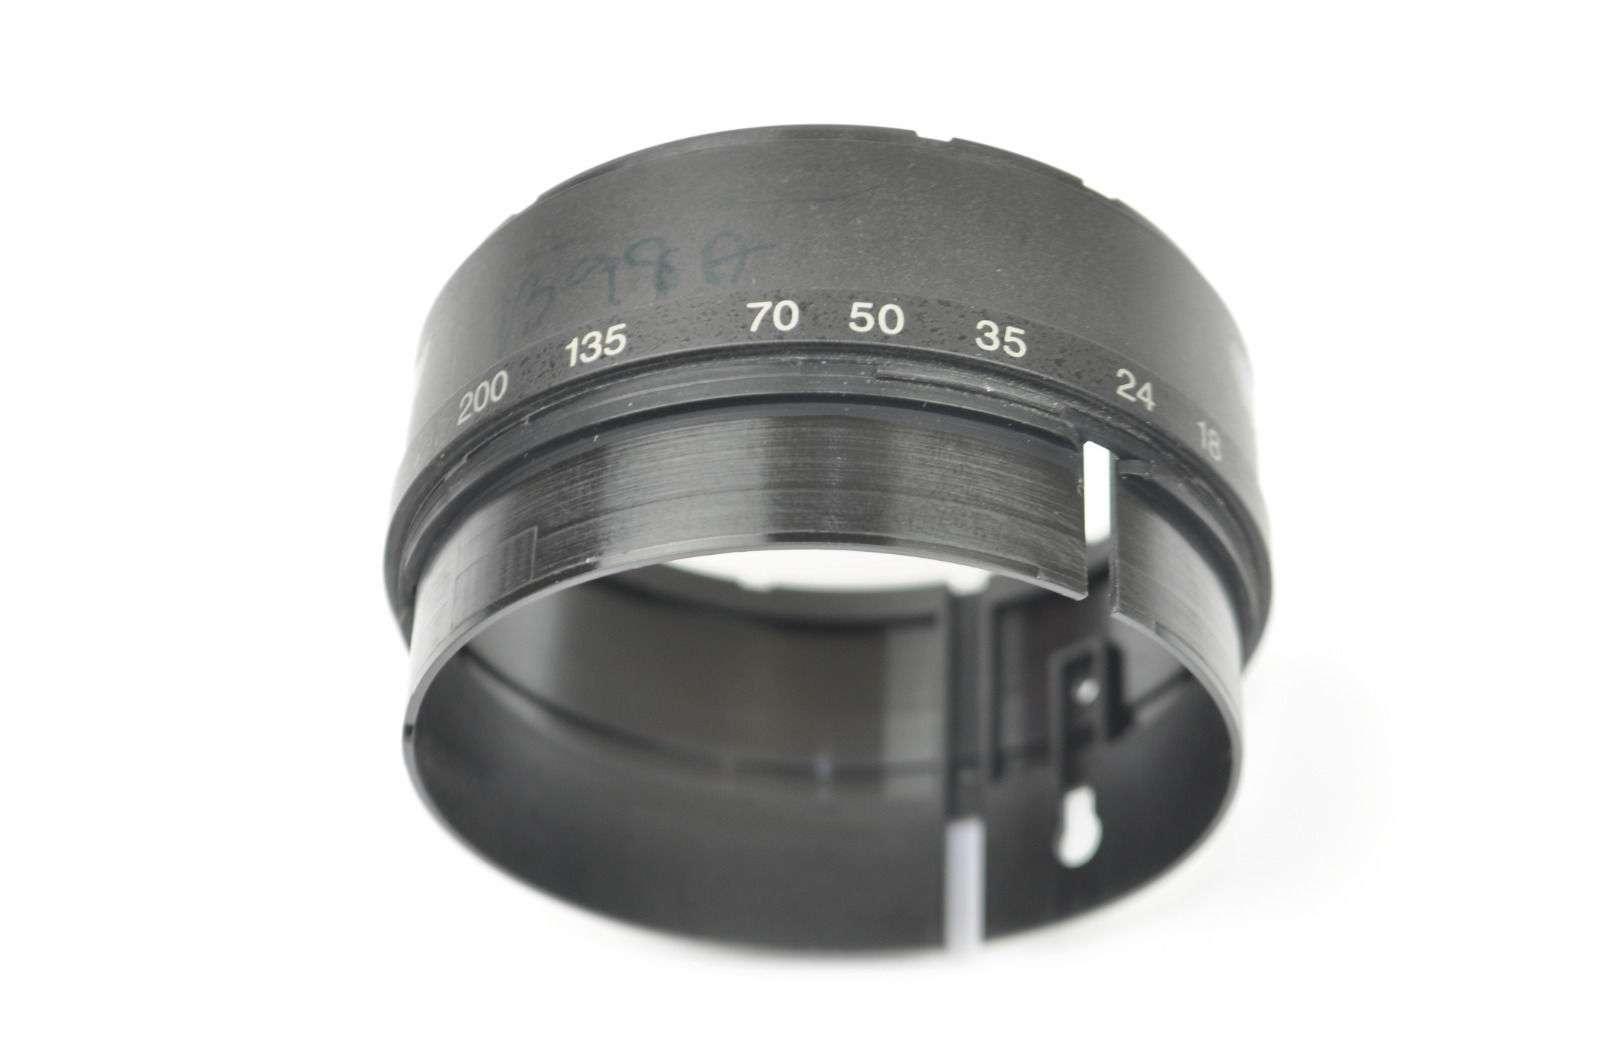 Lente de zoom anillo de goma Nikon AF-S DX de zoom Nikkor 17-55mm 1:2,8g if-ed ag1027